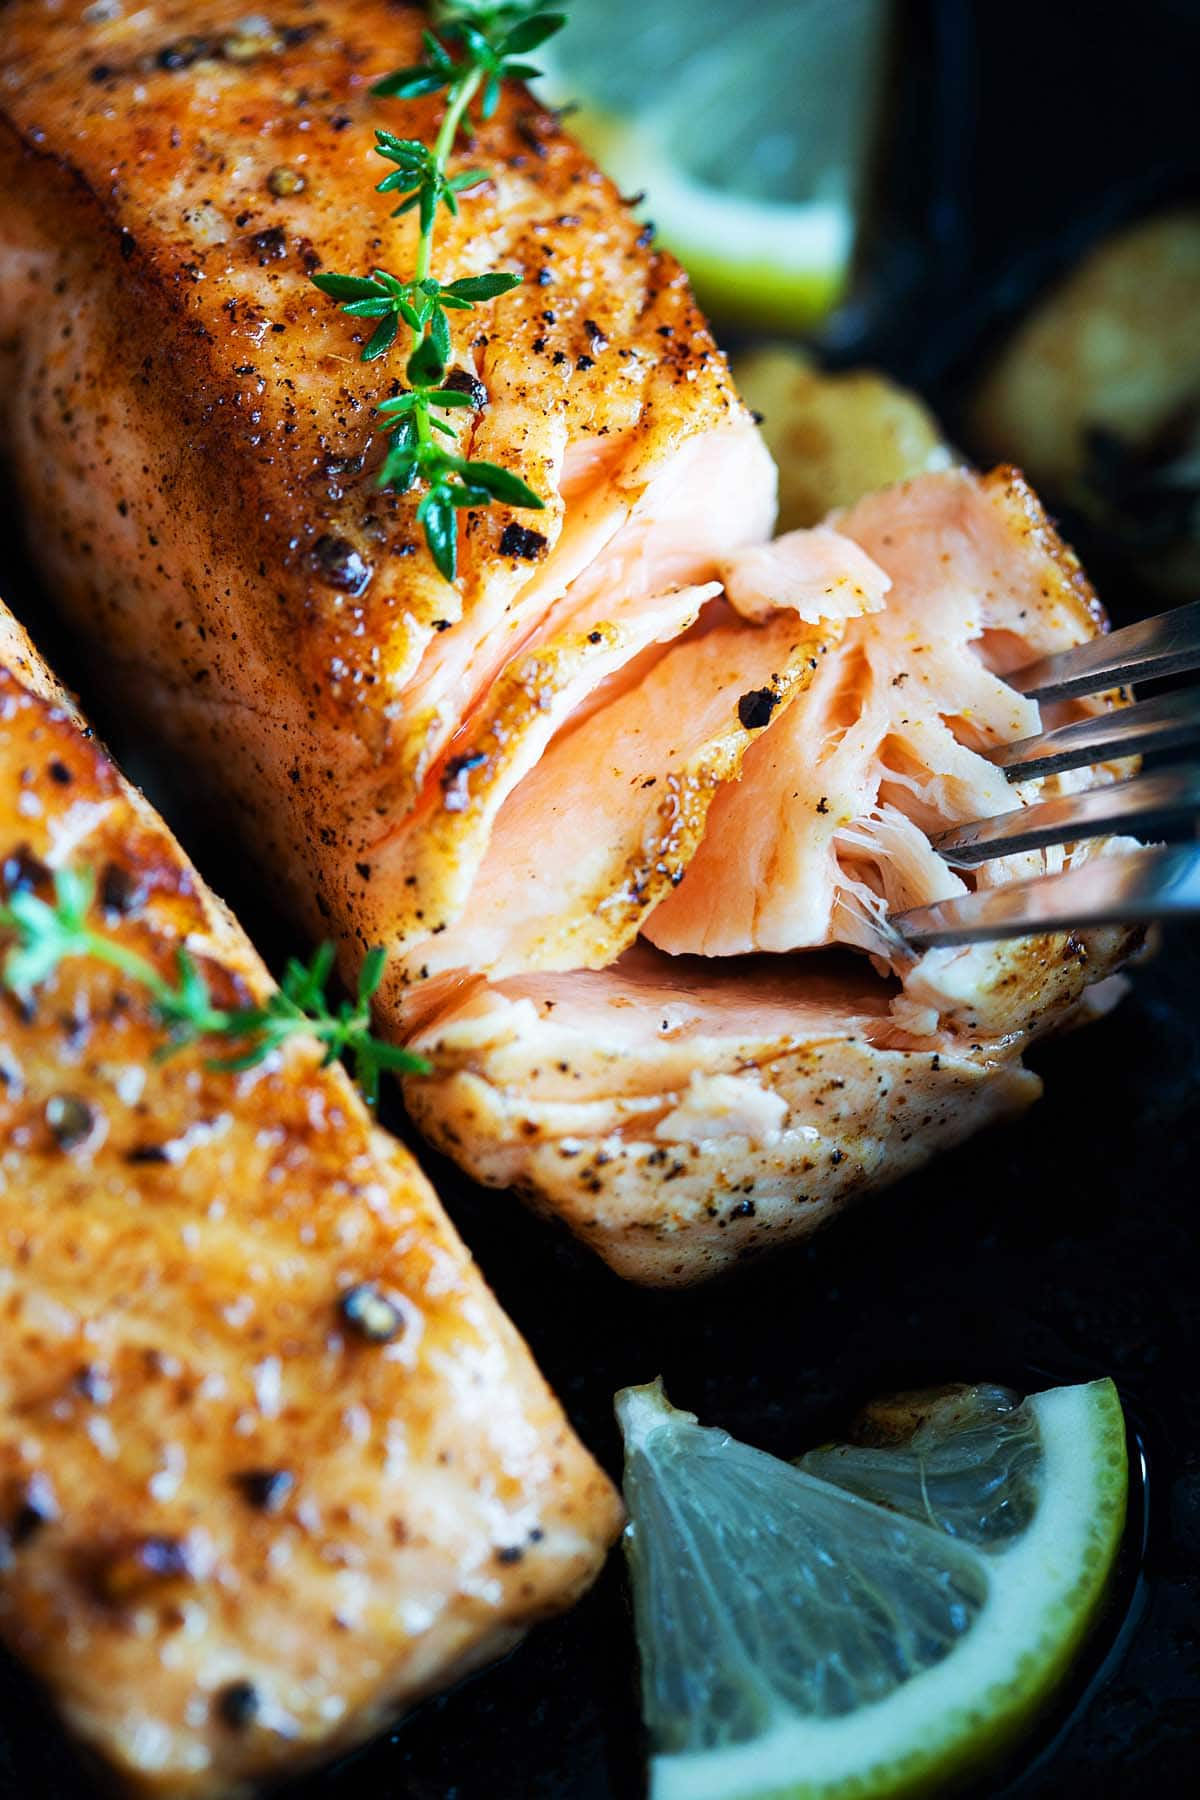 Pan seared salmon with skin, ready to serve.